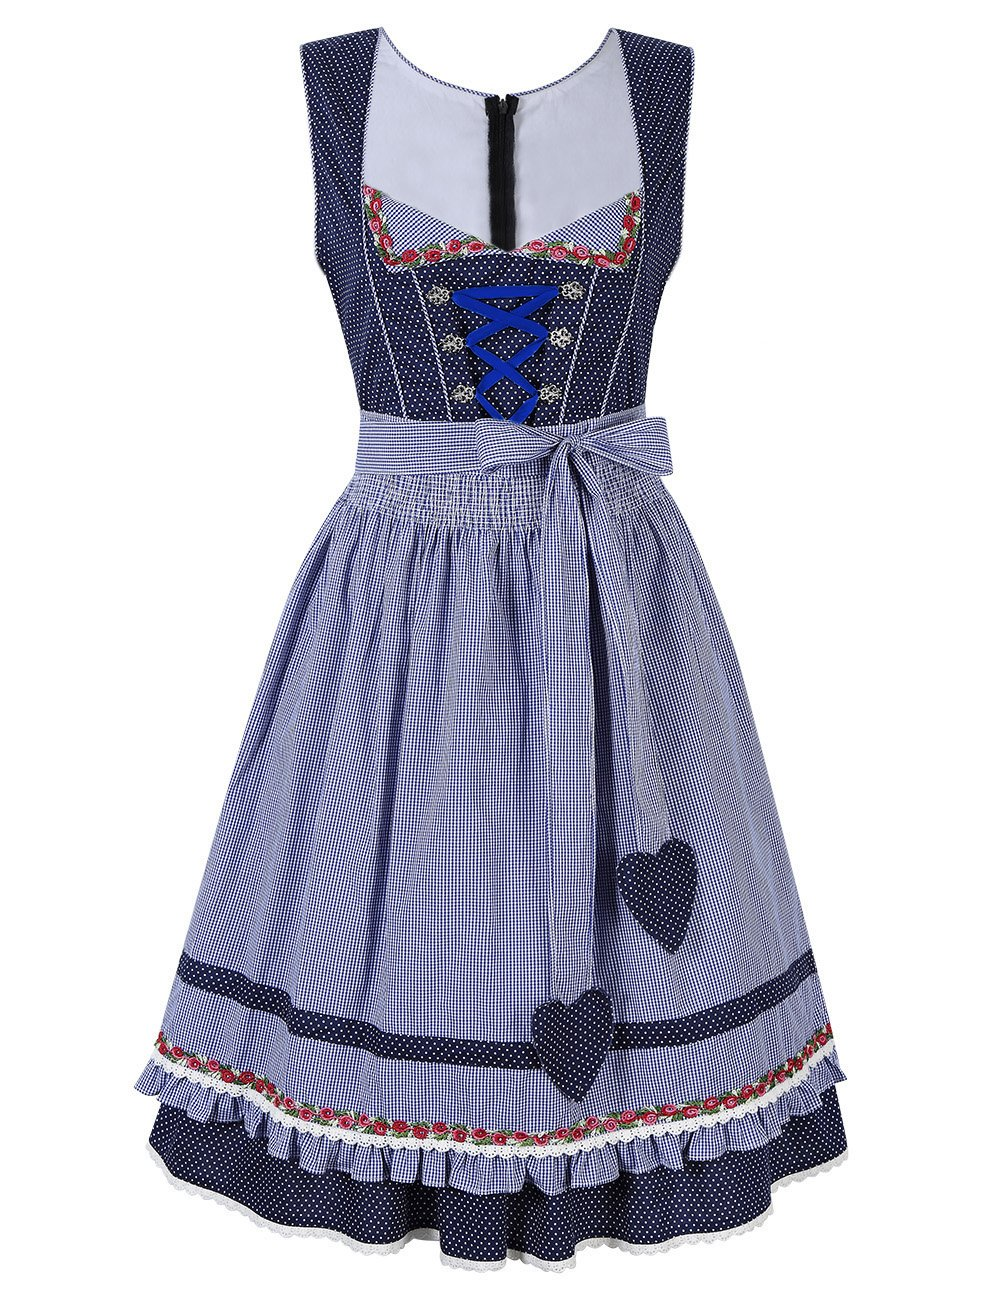 Leoie Kojooin Women's 2 Pcs Dirndl Dress Bavarian Beer Oktoberfest Costume Blue 36